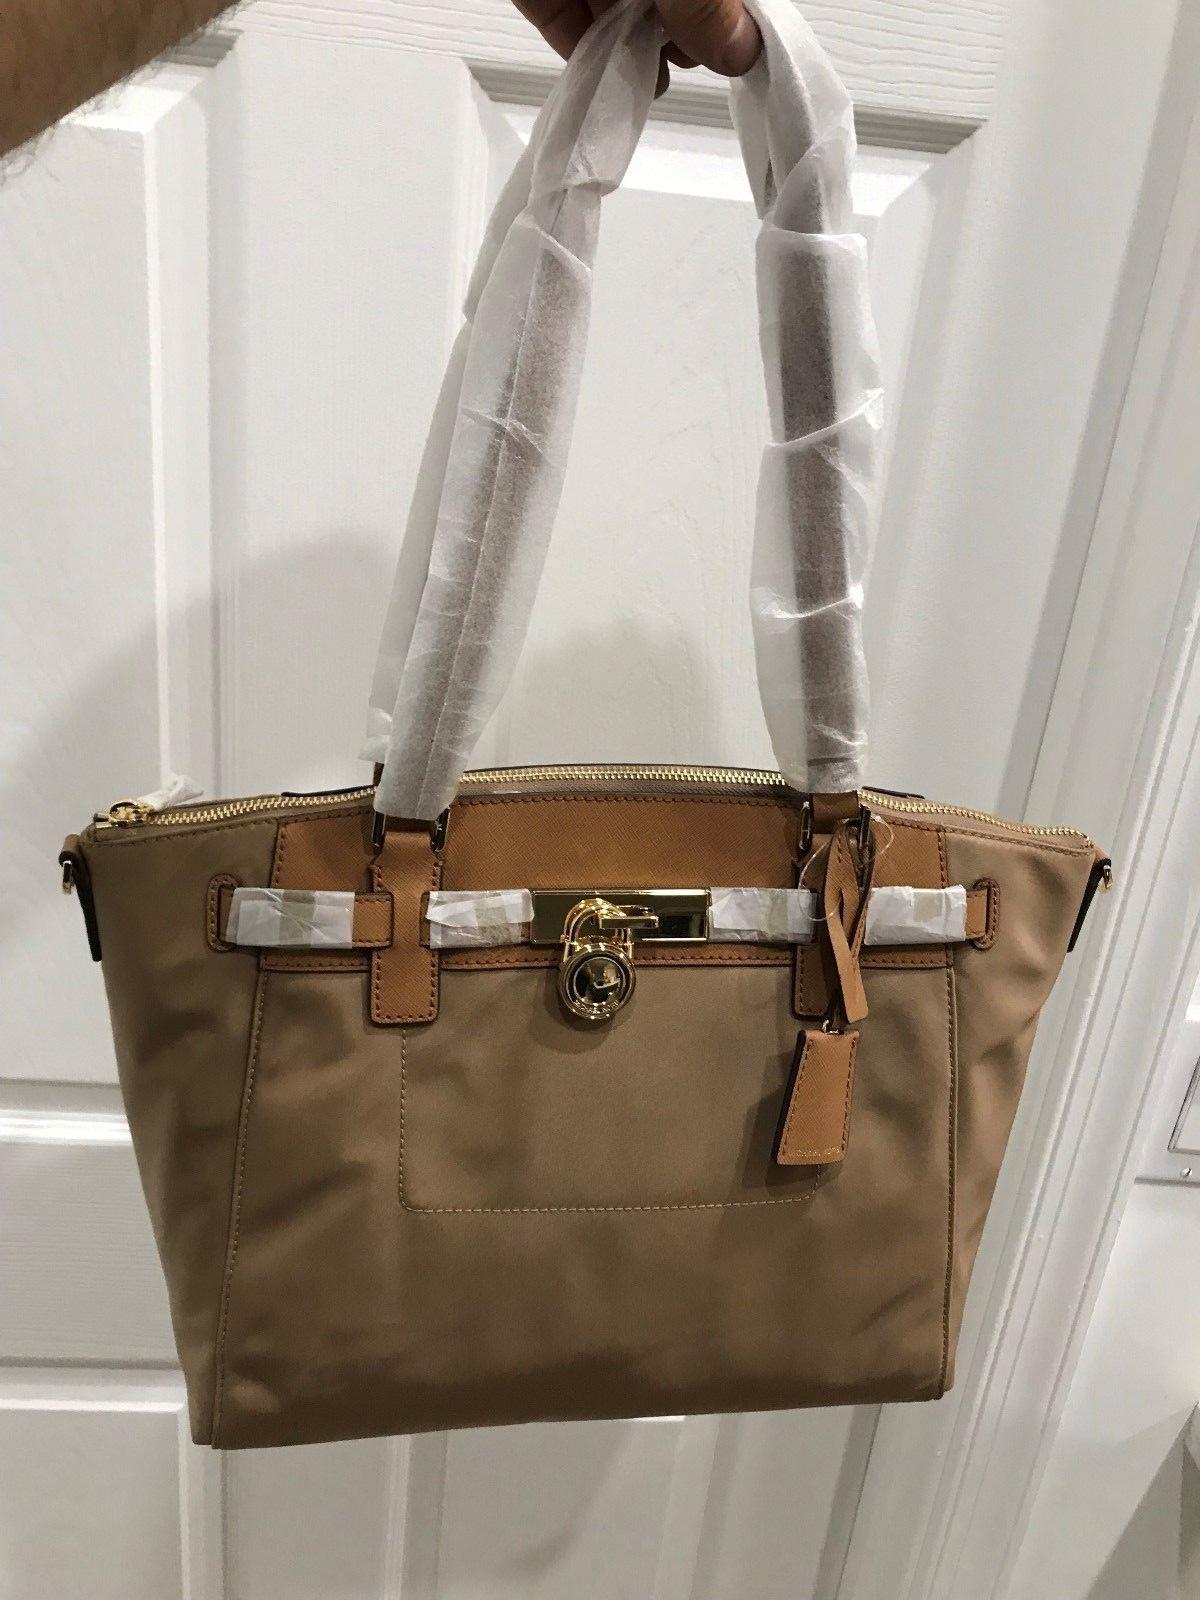 339cb9335065 Michael Kors Hamilton Traveler Large Nylon & Leather Convertible Top Zip  Satchel